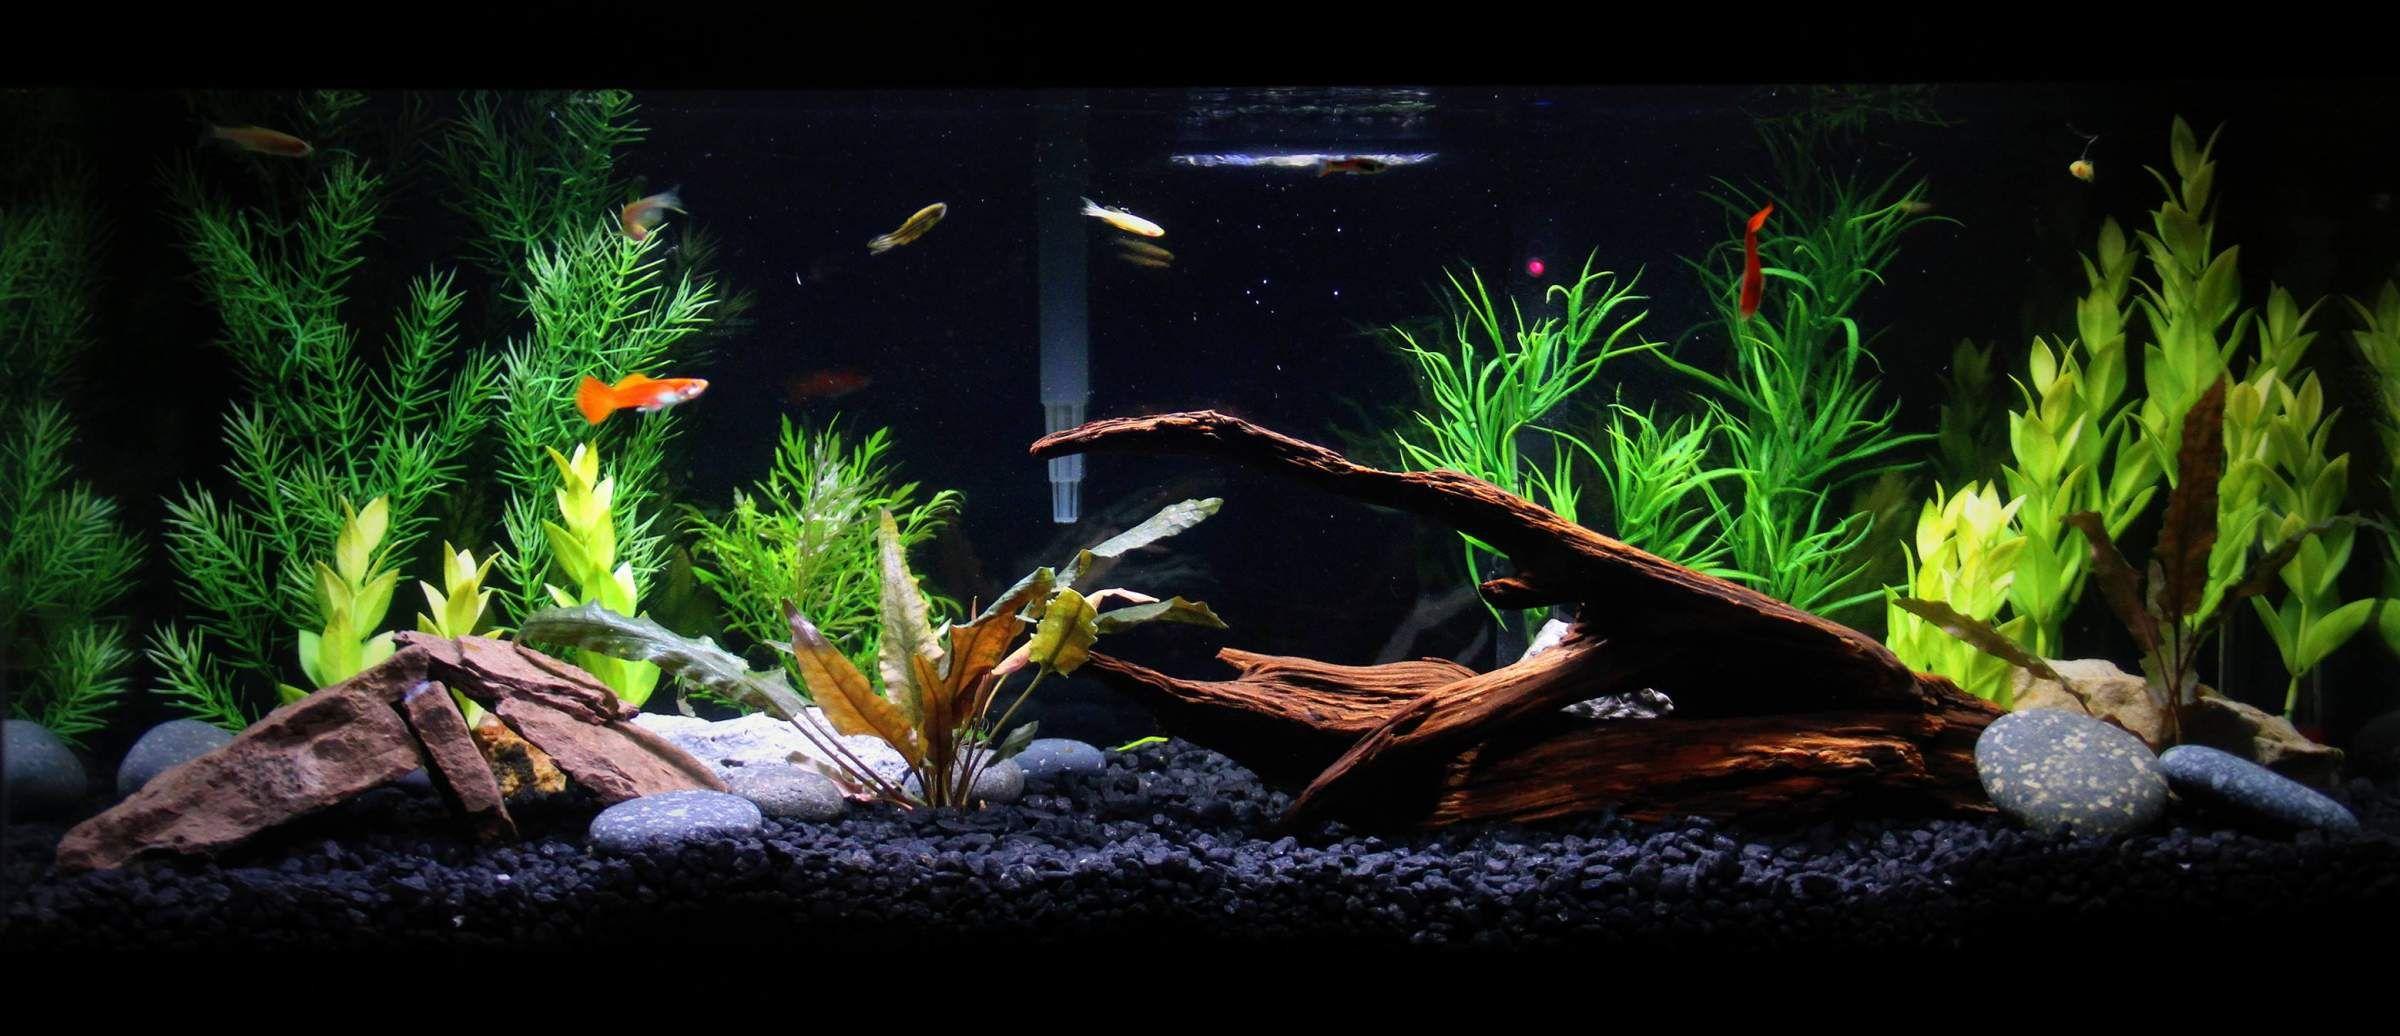 20 gallon aquarium live plants google search pets and for Fish tank 20 gallon